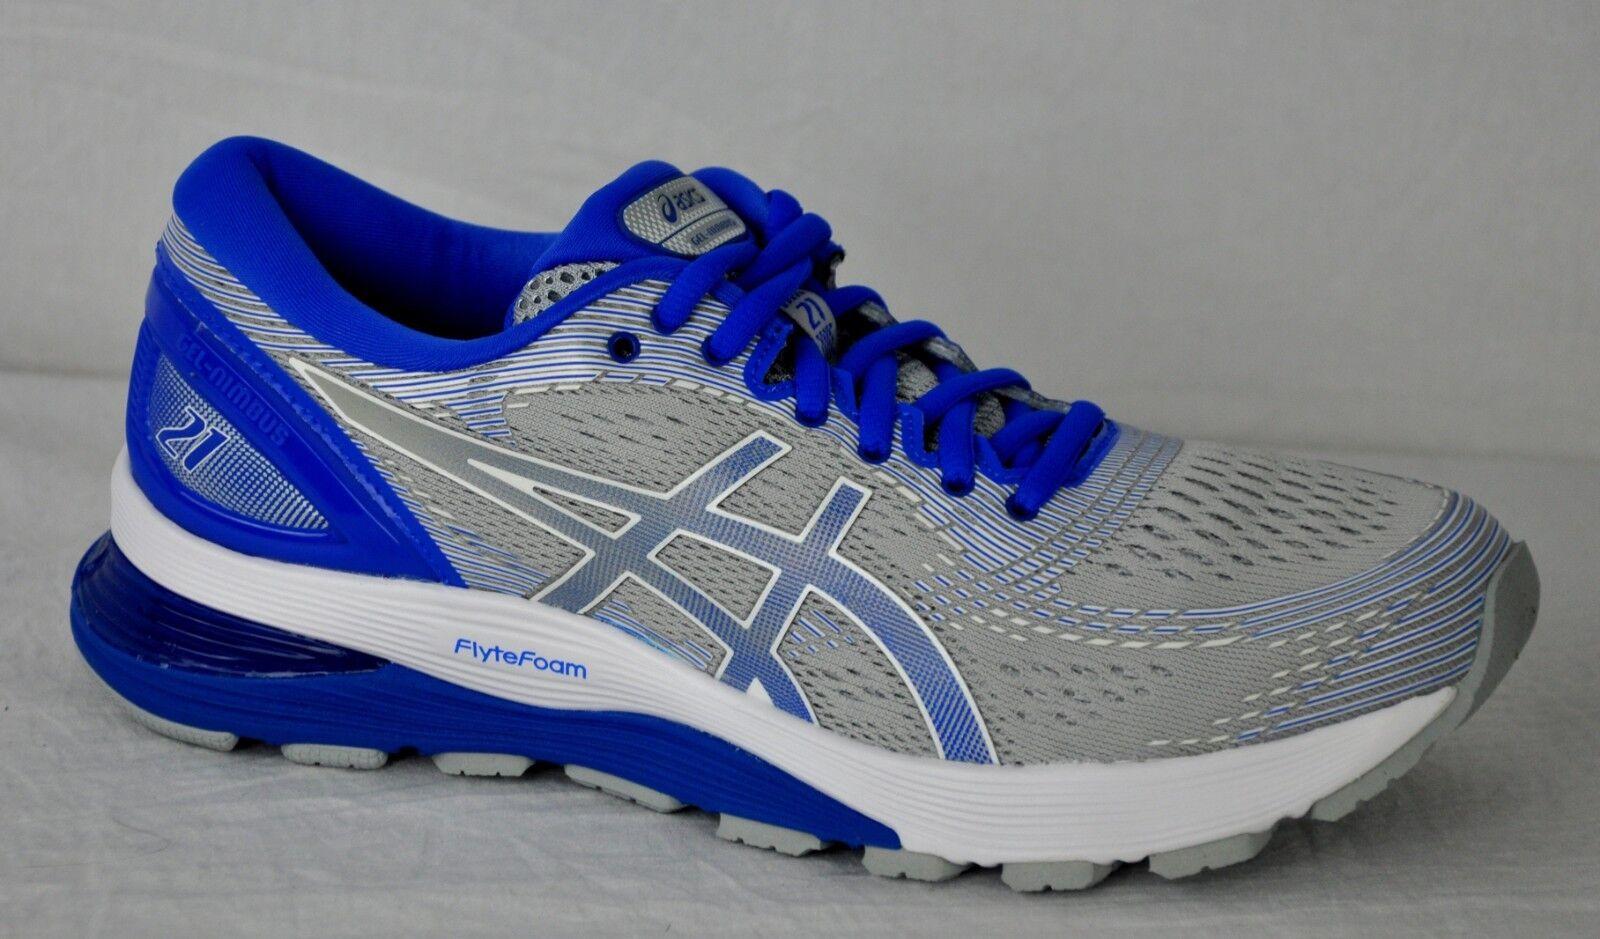 Asics Asics Asics de mujer Gel nimbus 21 Lite-Show Zapatos 1012A189 gris Medio ilusn azul SZ 11  60% de descuento